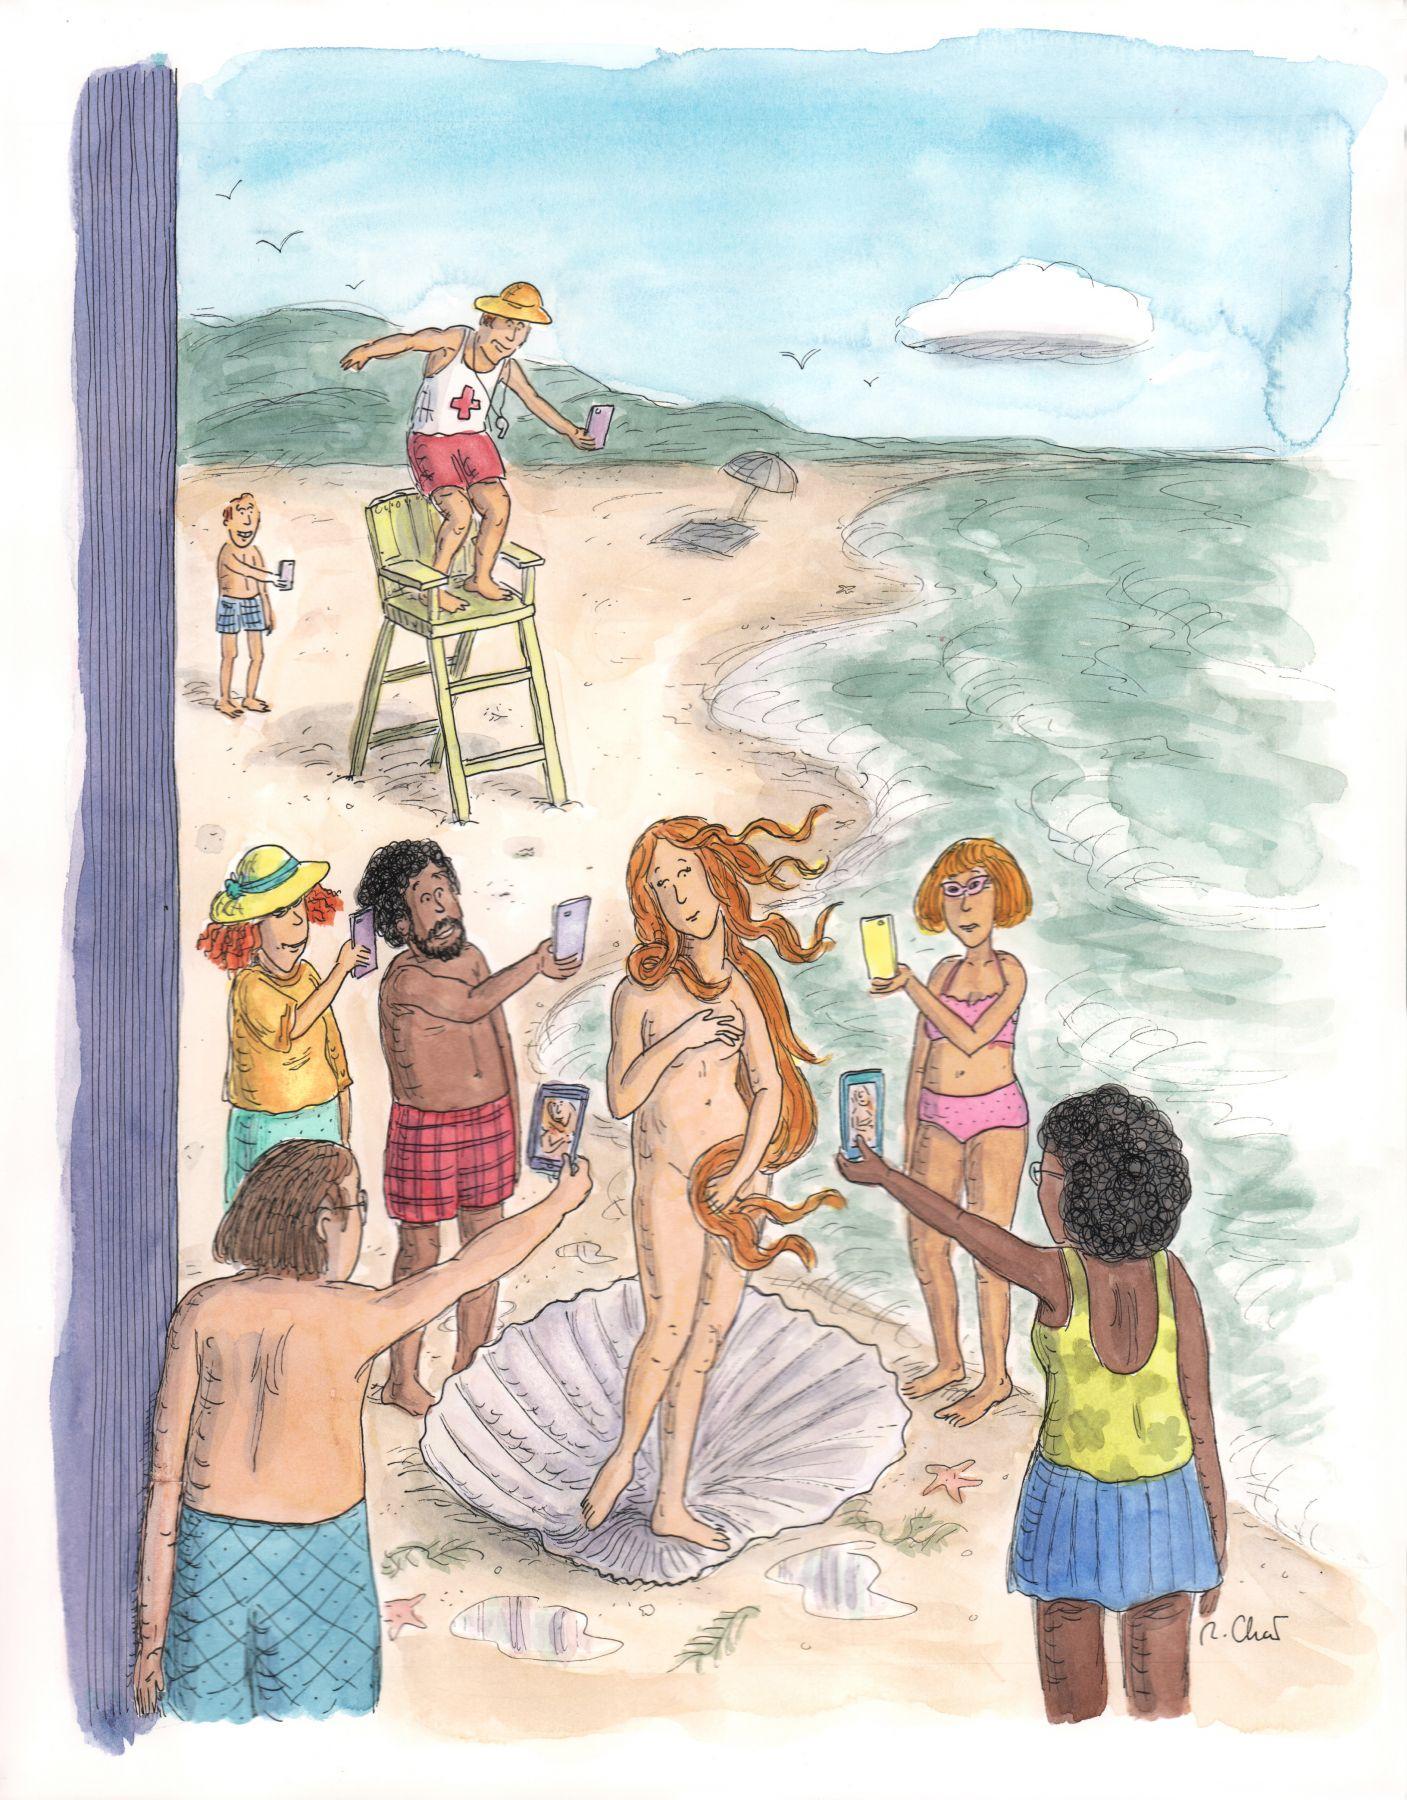 Roz Chast, Venus di Milo Cover, published Aug. 4, 2014